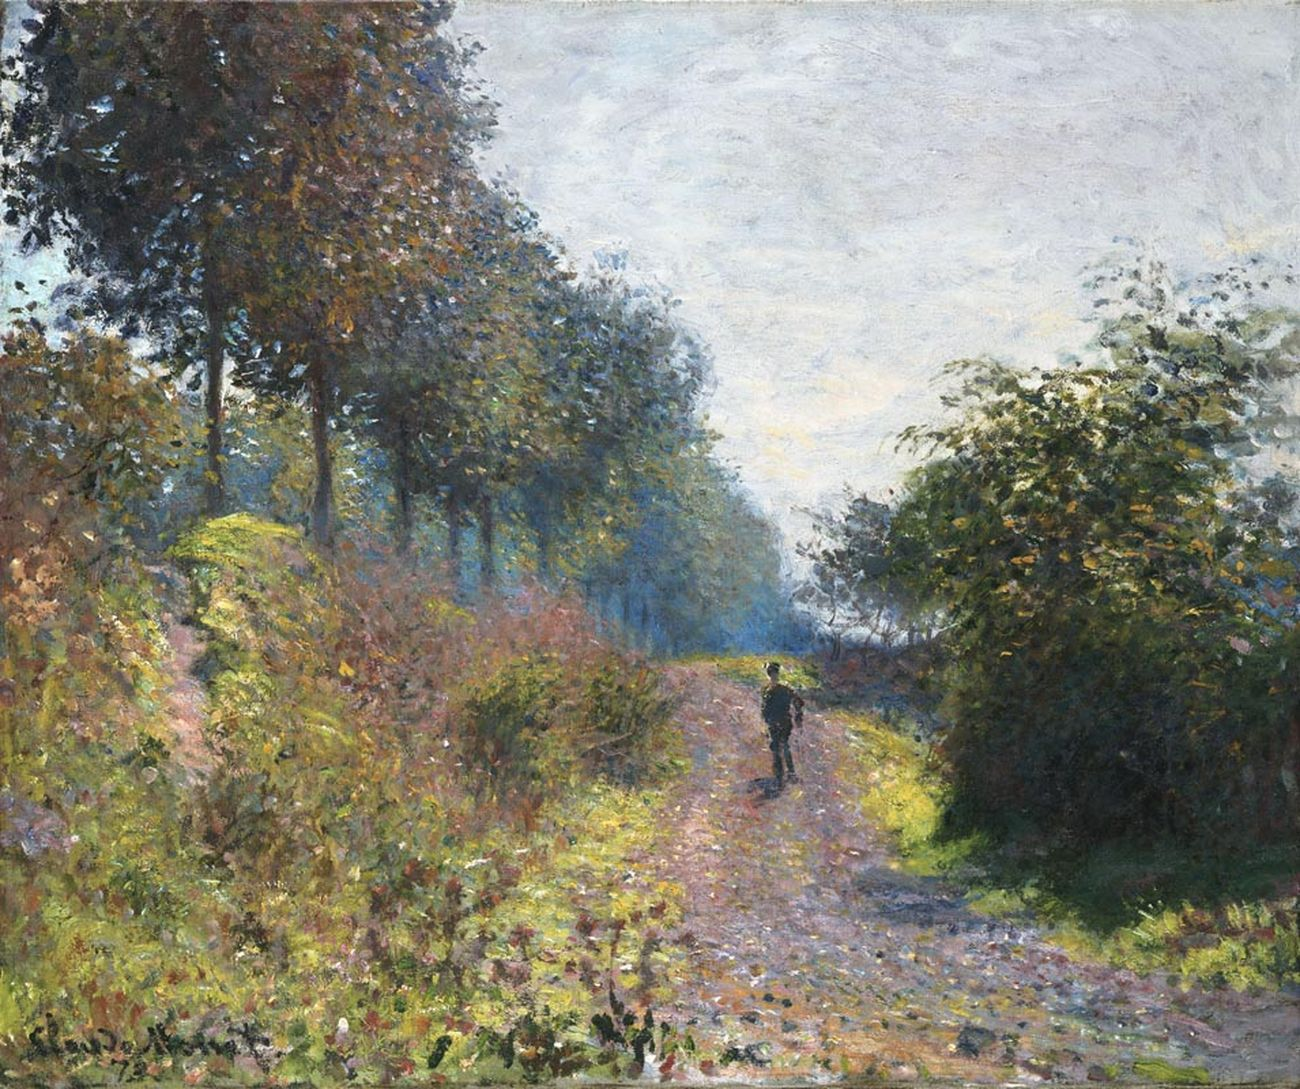 Claude Monet, Sentiero riparato (1873; olio su tela, 54,1 x 65,7 cm; Filadelfia, Philadelphia Museum of Art)